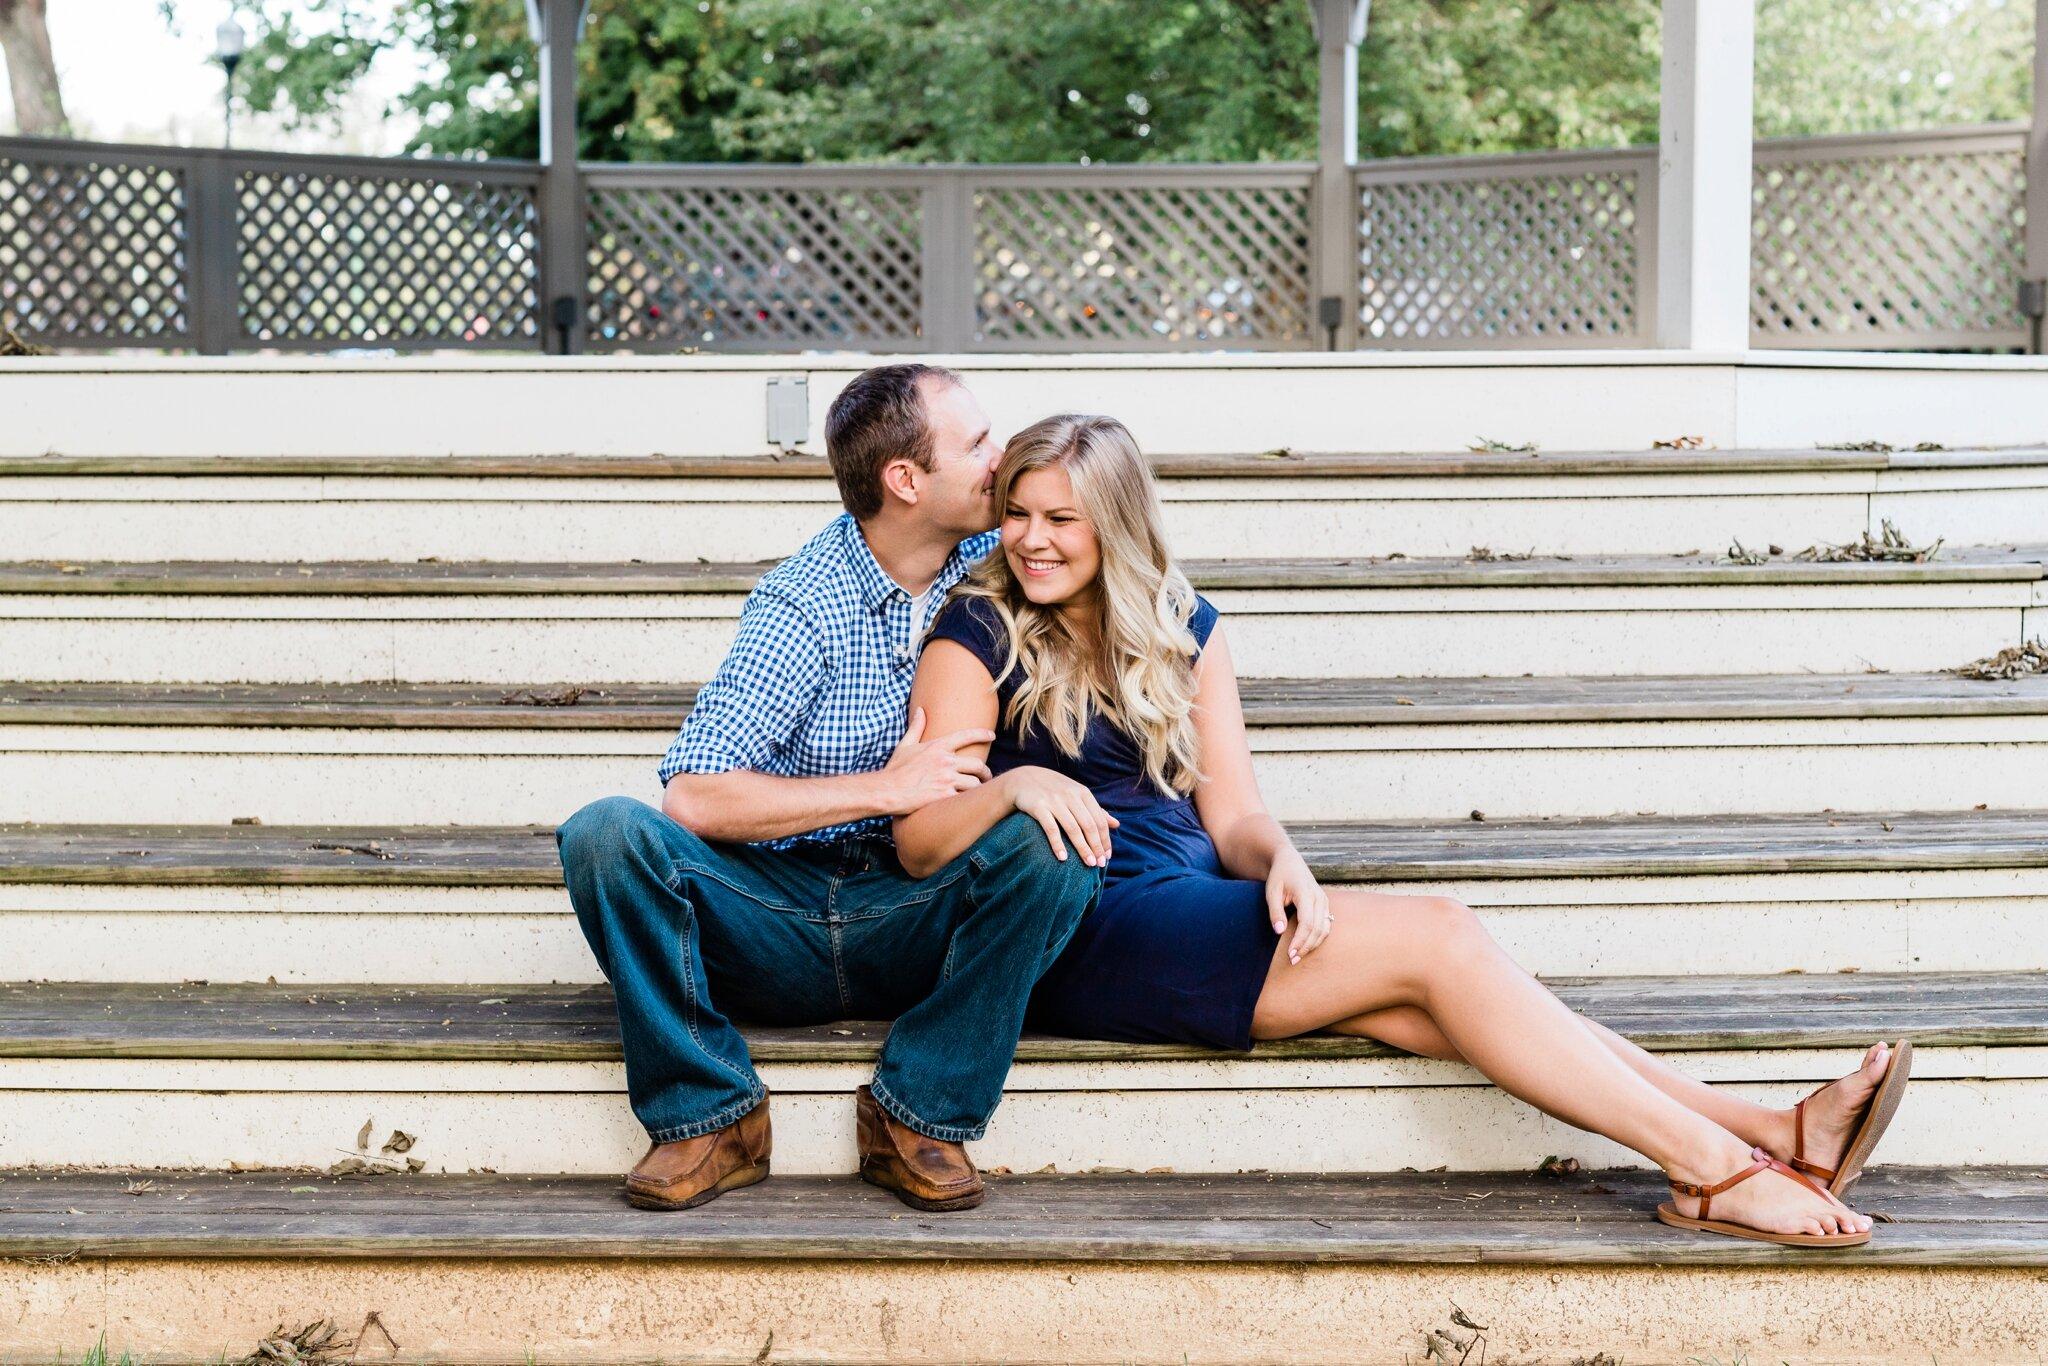 Emily Grace Photography, Lancaster PA Wedding Photographer, General Sutter Inn Wedding Venue, Lititz Wedding Venue, Lititz Springs Park Engagement Photos, Lititz Springs Park Wedding Ceremony